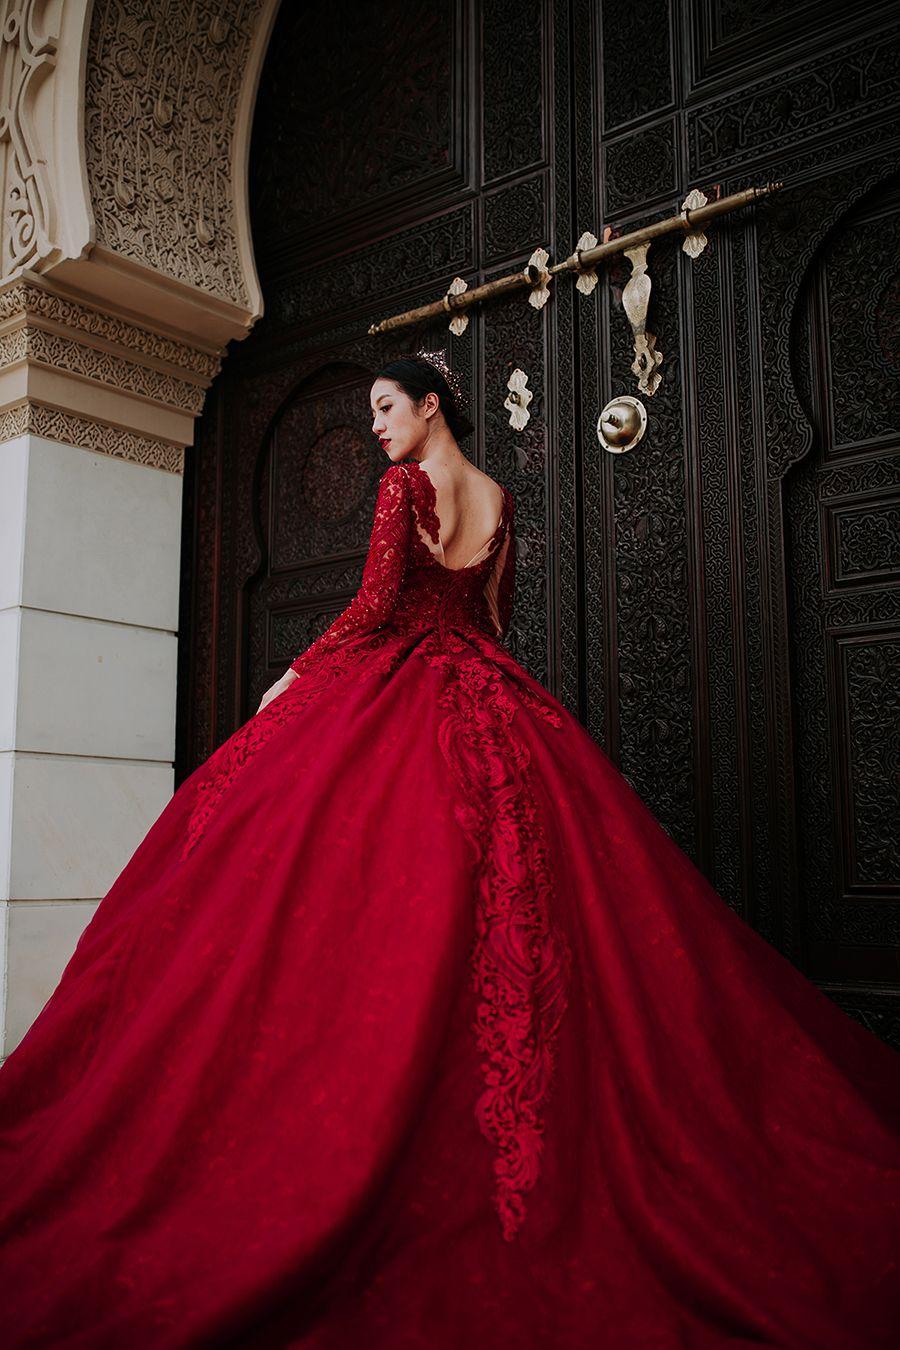 A Sense Of Grandeur A Styled Shoot At Astaka Morocco Putrajaya Colored Wedding Dress Colored Wedding Dresses Ball Gowns [ 1350 x 900 Pixel ]